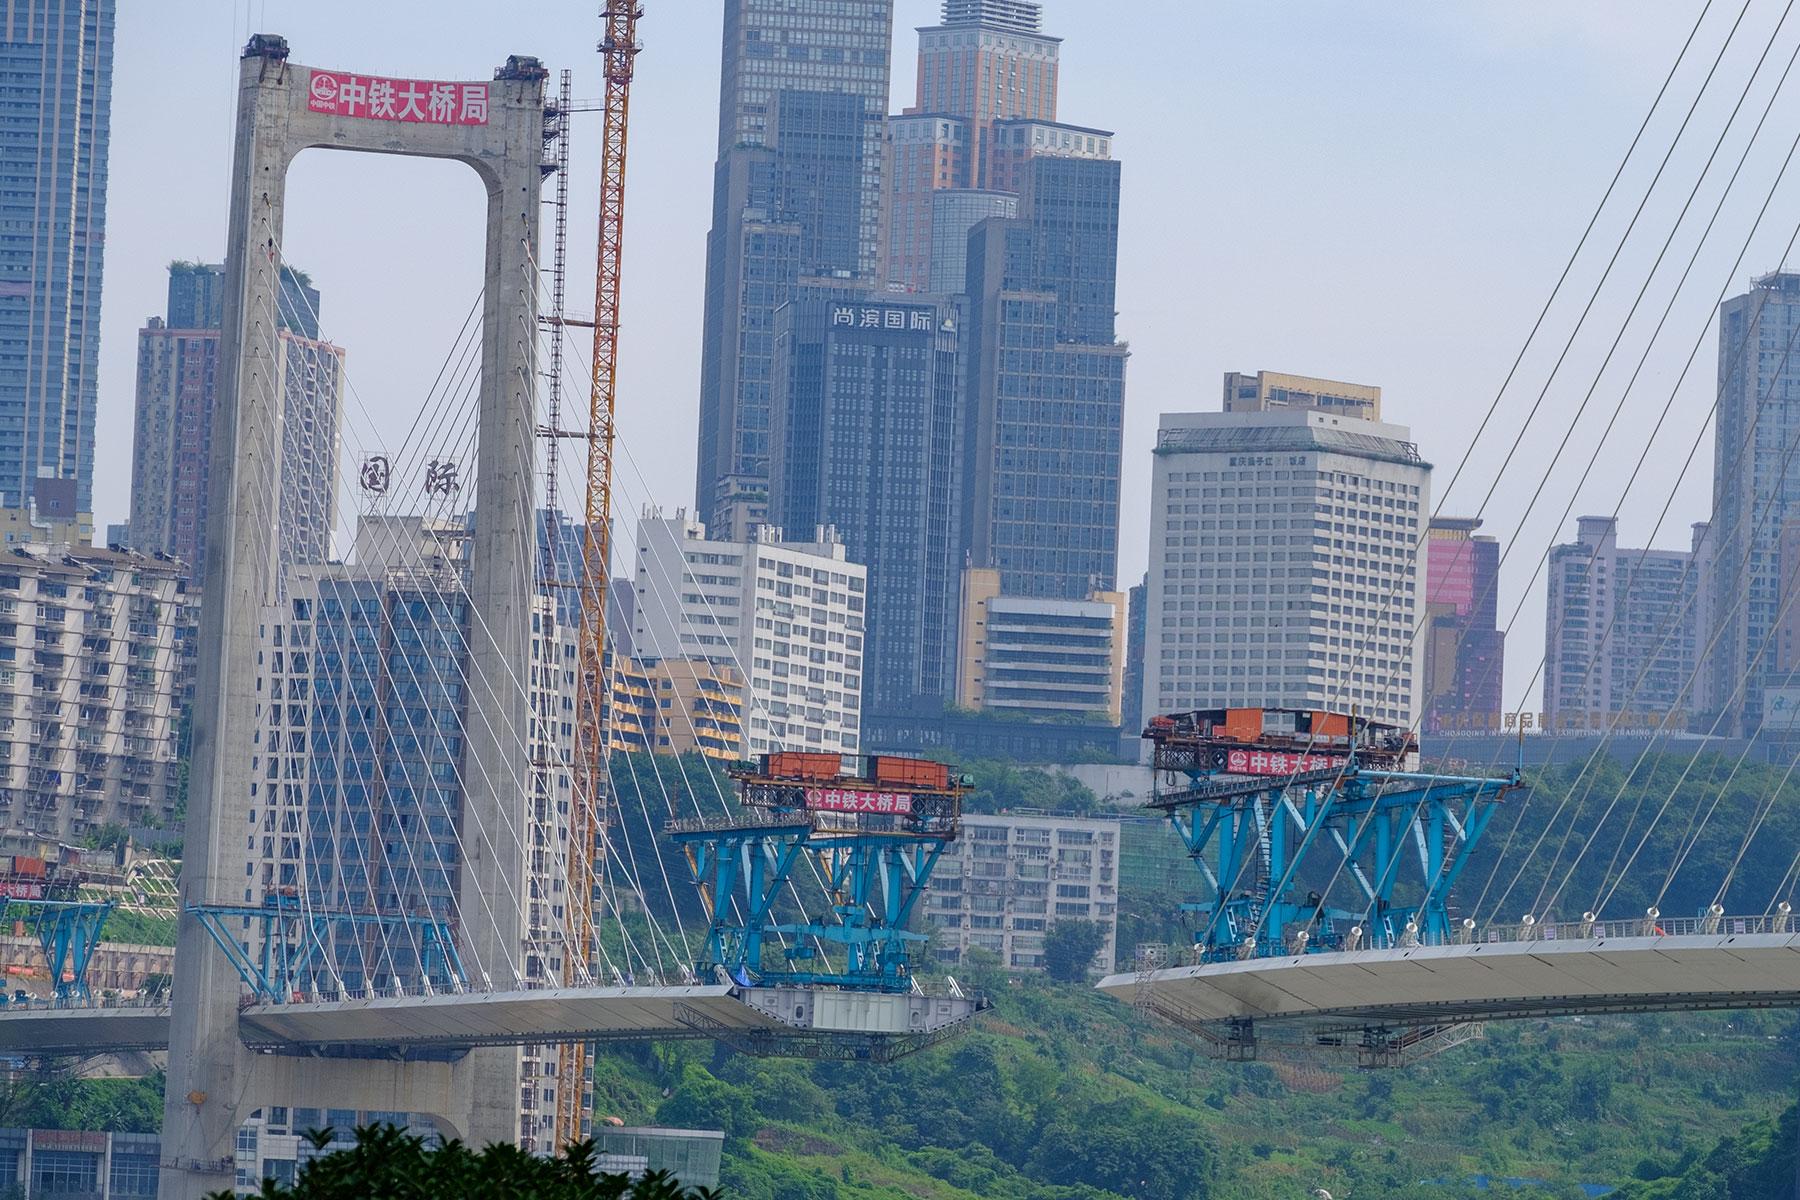 Brückenbau in Chongqing